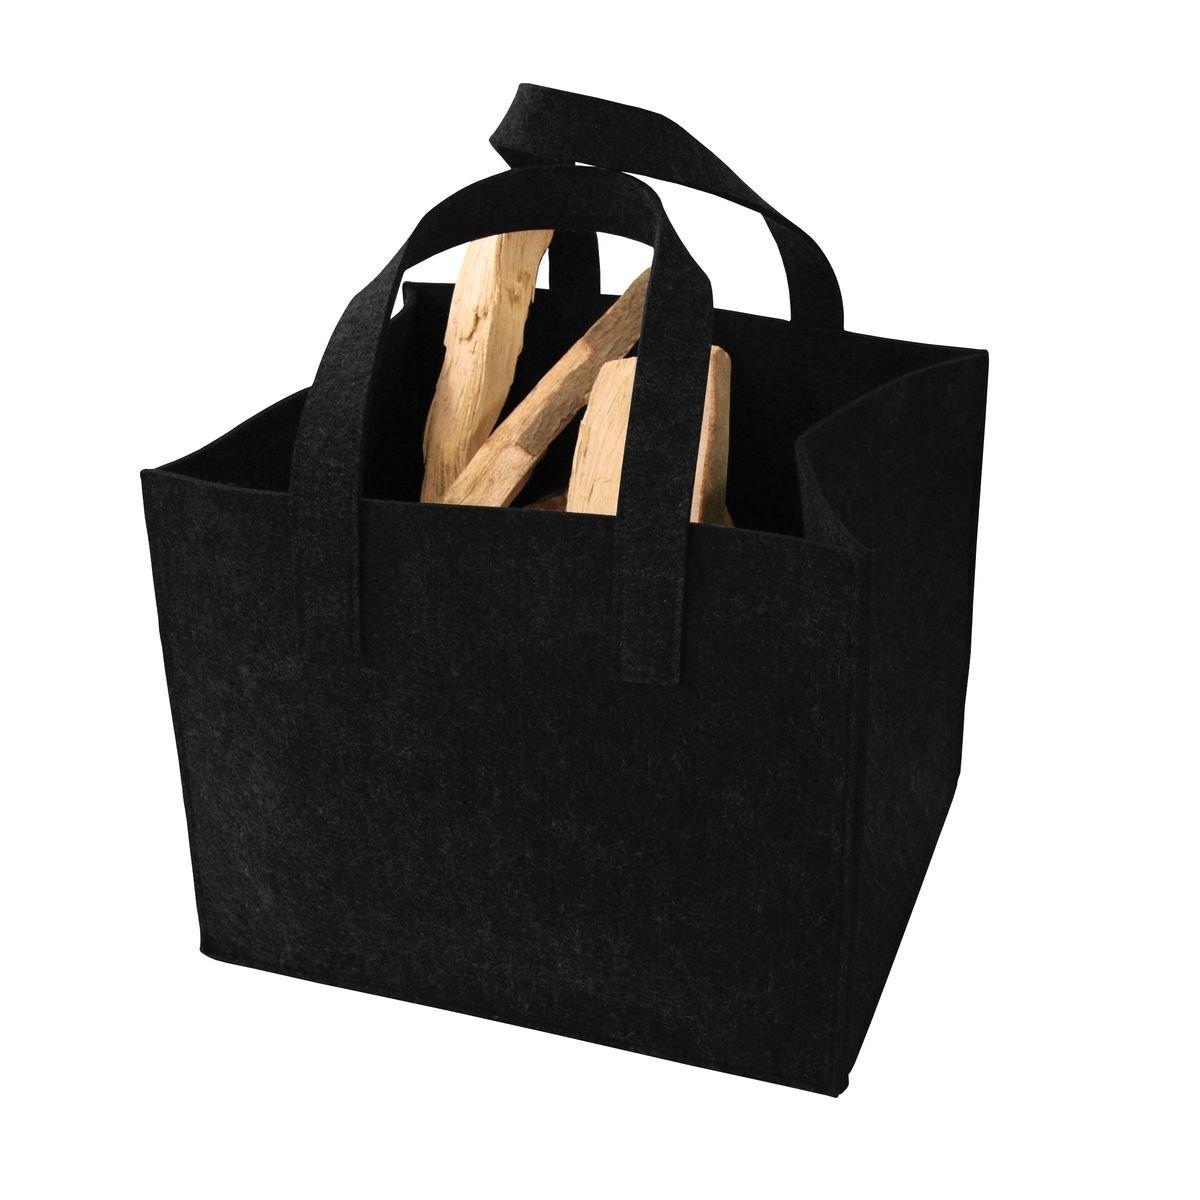 Negro le/ña Cesta chimenea madera cesta rectangular Chimenea Madera Funda multiusos cesta para le/ña funda de fieltro para le/ña revistero para madera